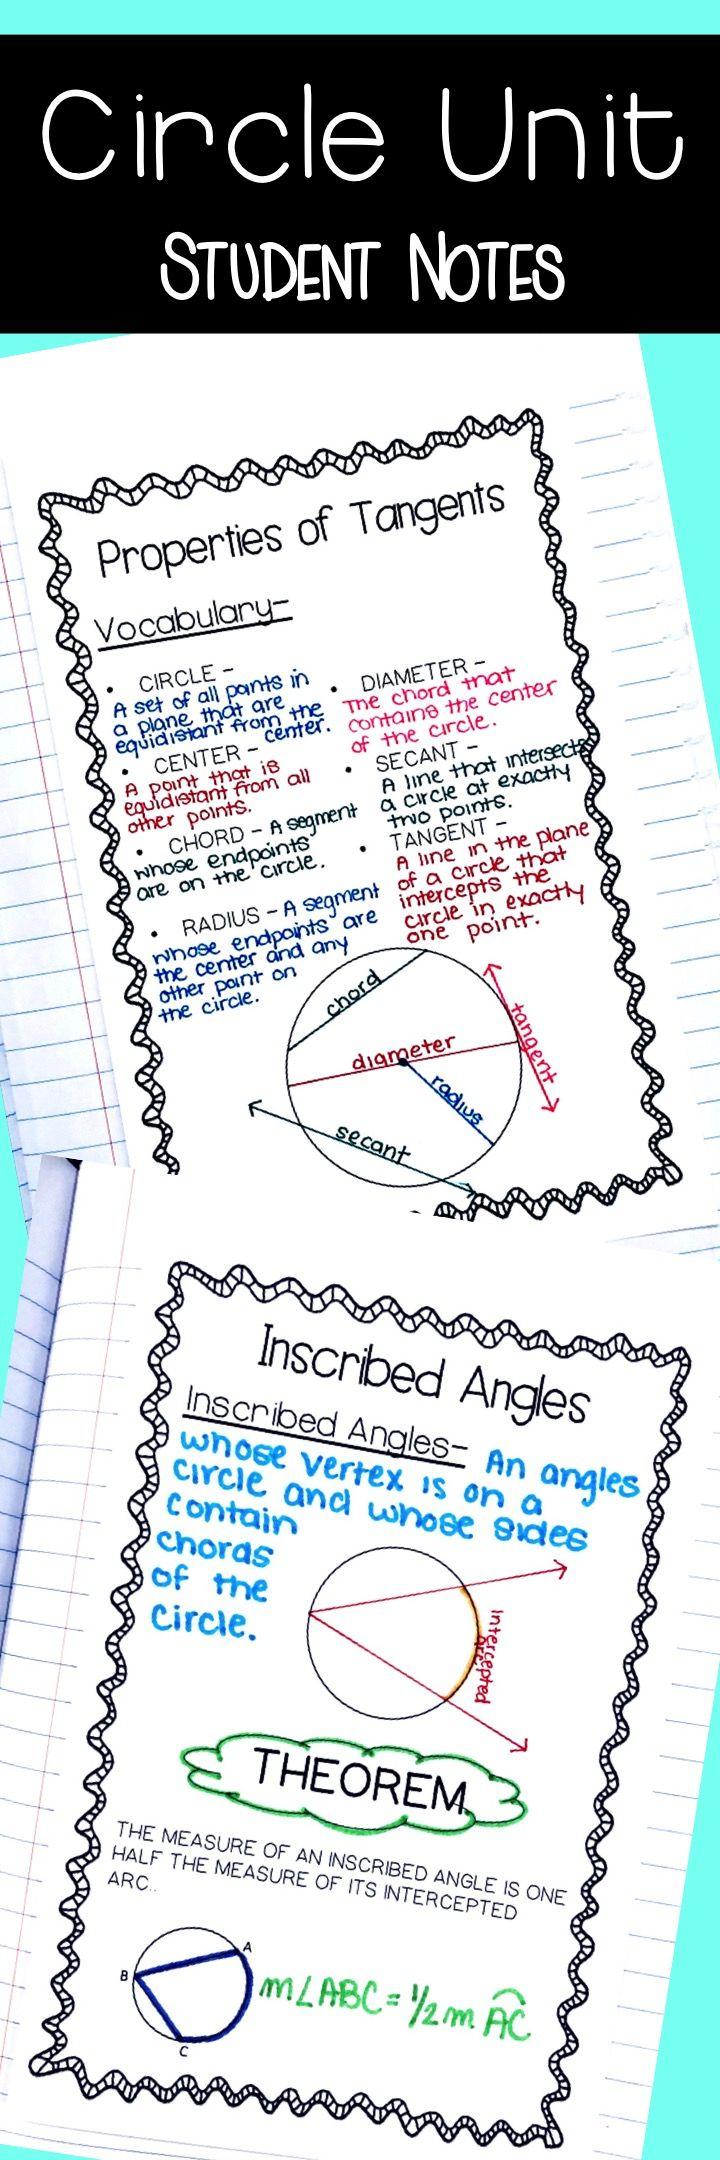 Circles Unit - Homework/ Quizzes/ Unit Test   High School Math Ideas